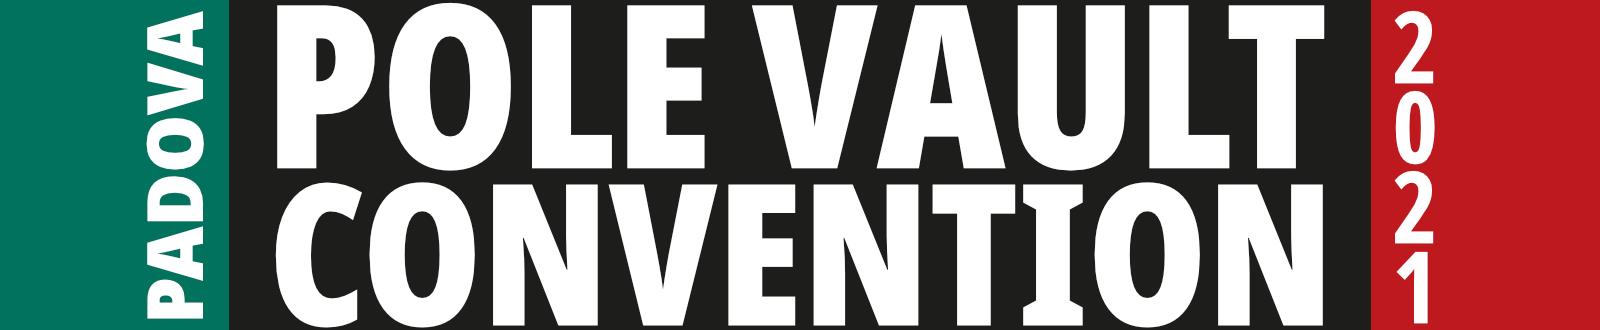 Padova Pole Vault Convention